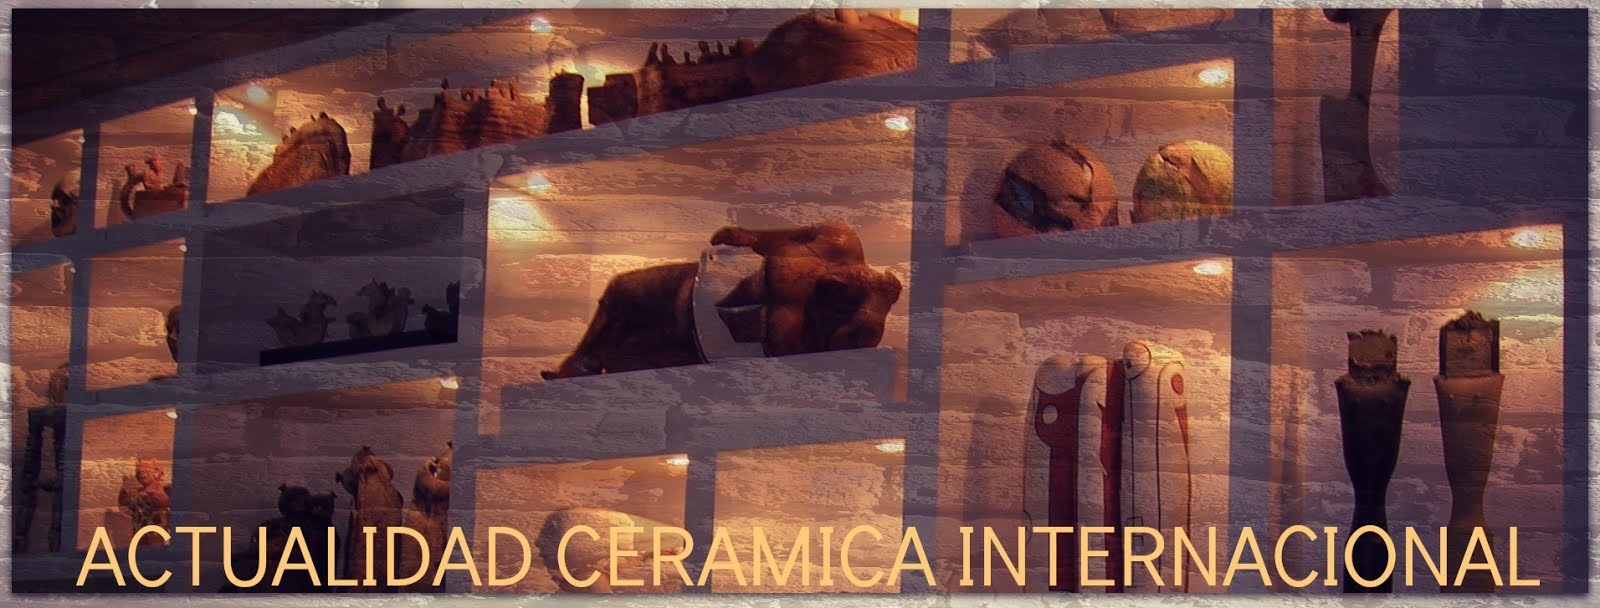 Actualidad Cerámica Internacional